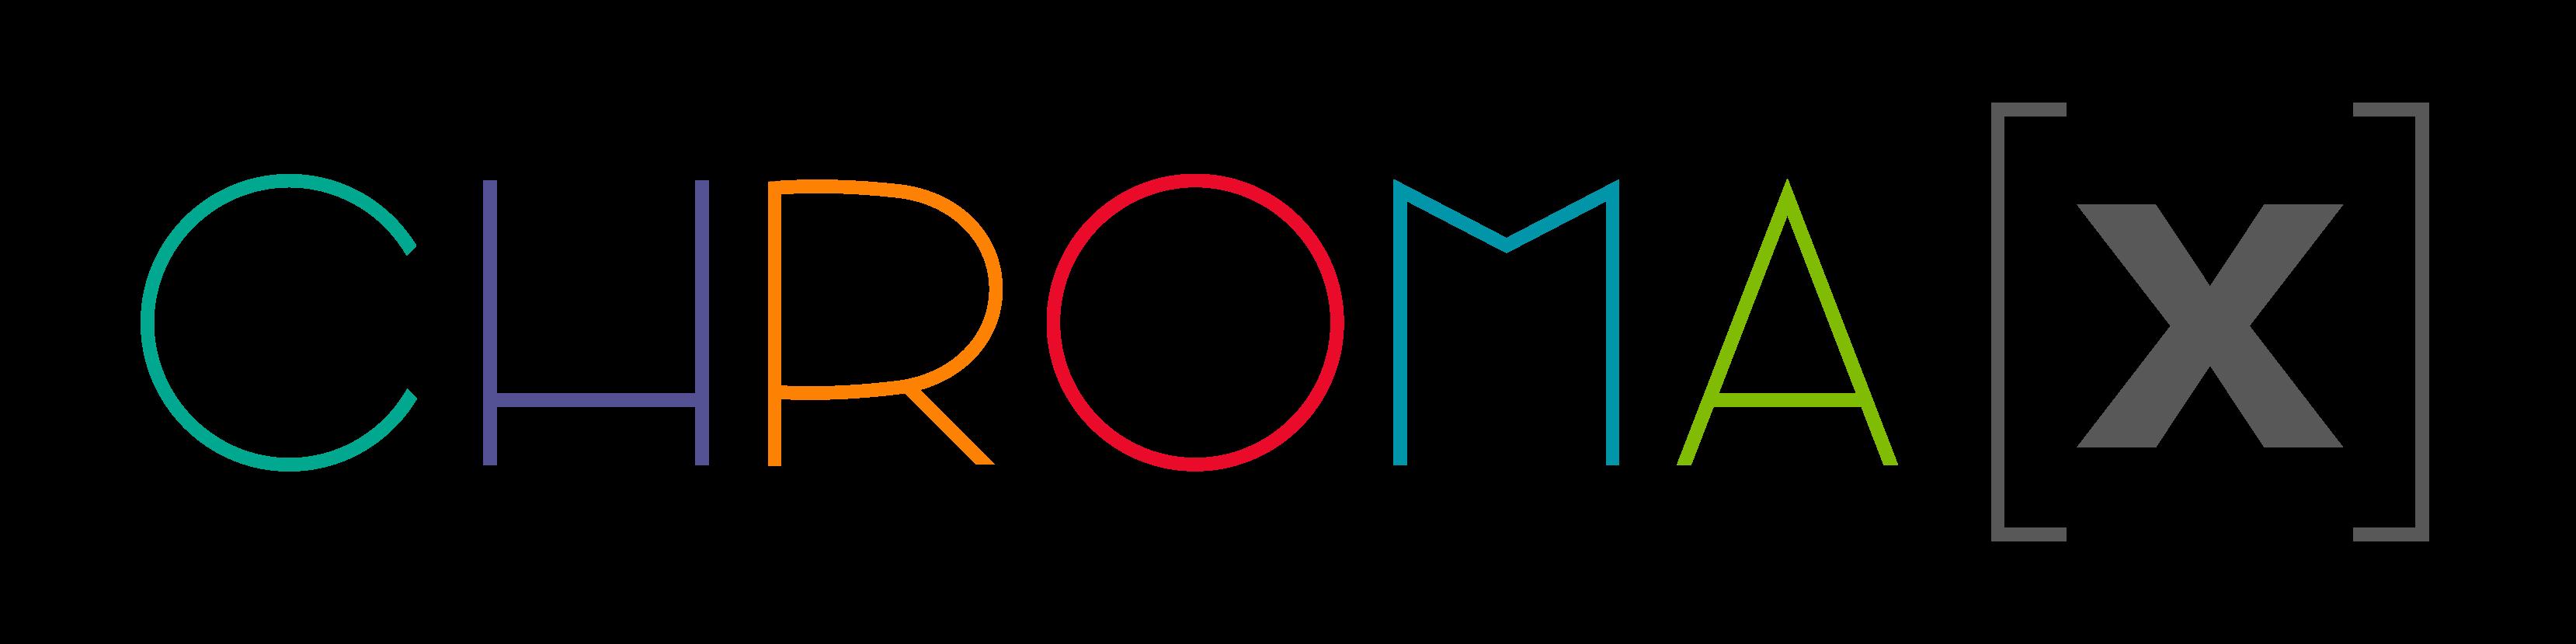 Chroma [X]